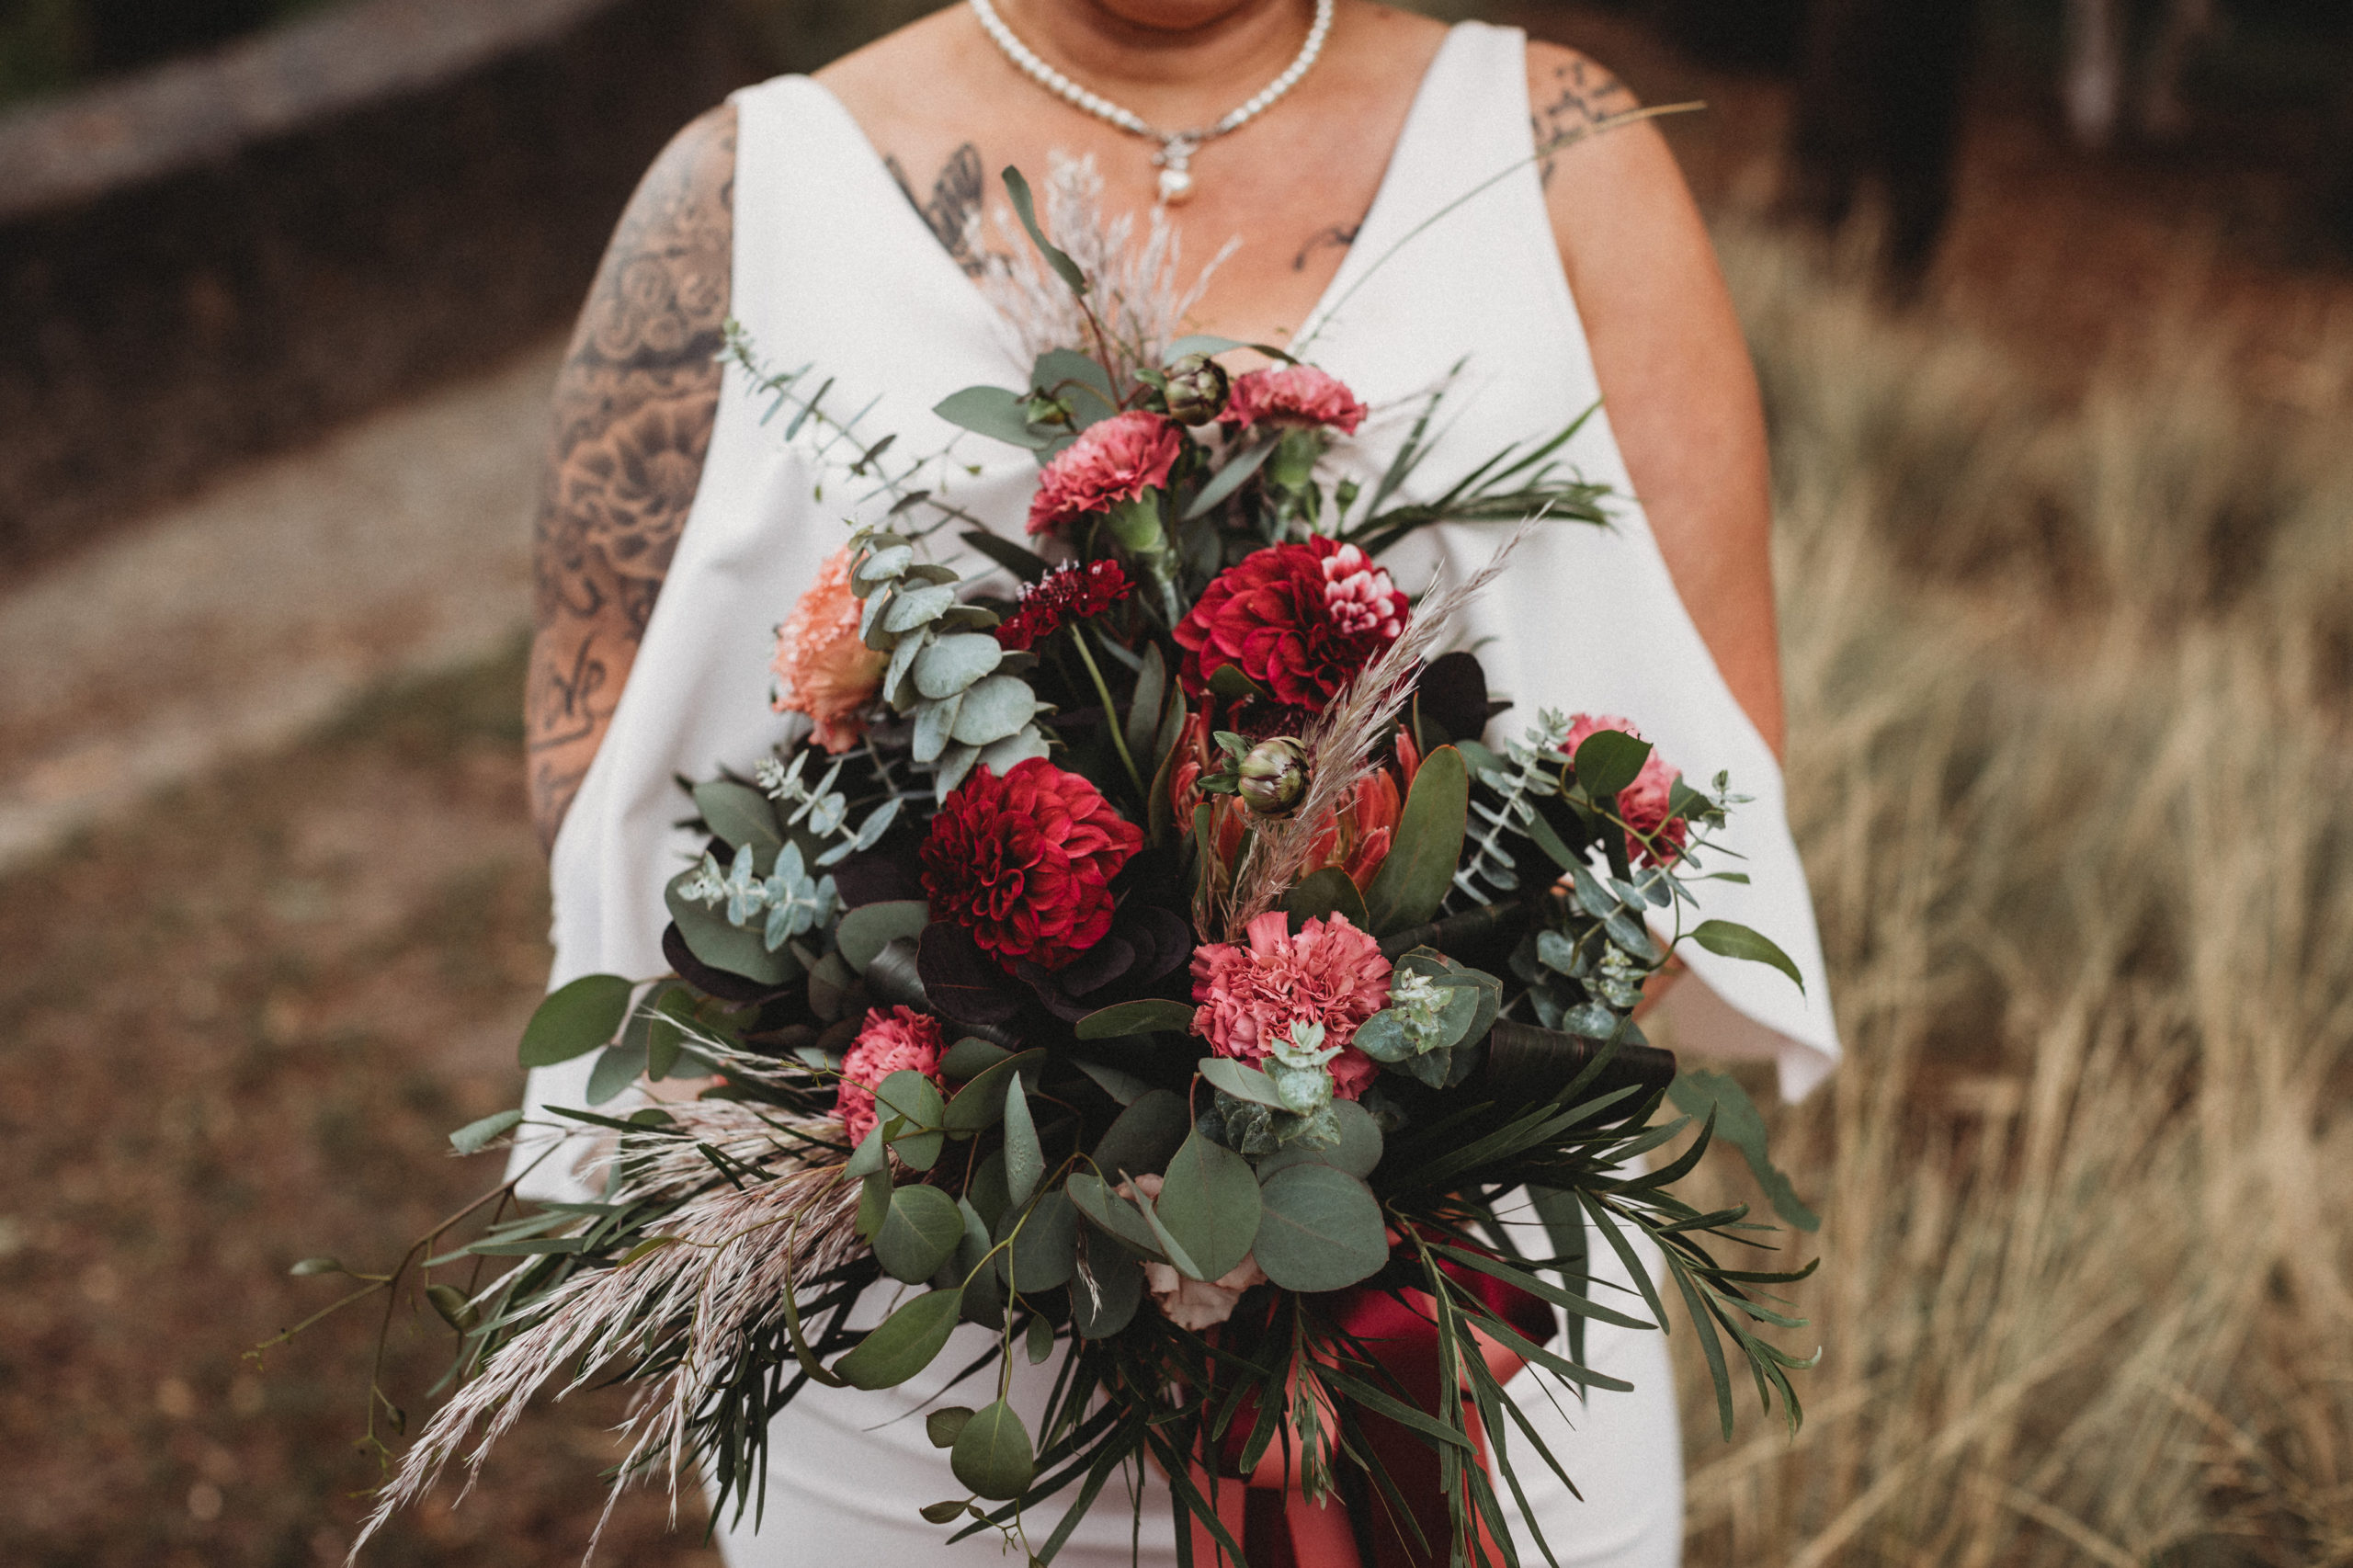 Bride holding bouqet